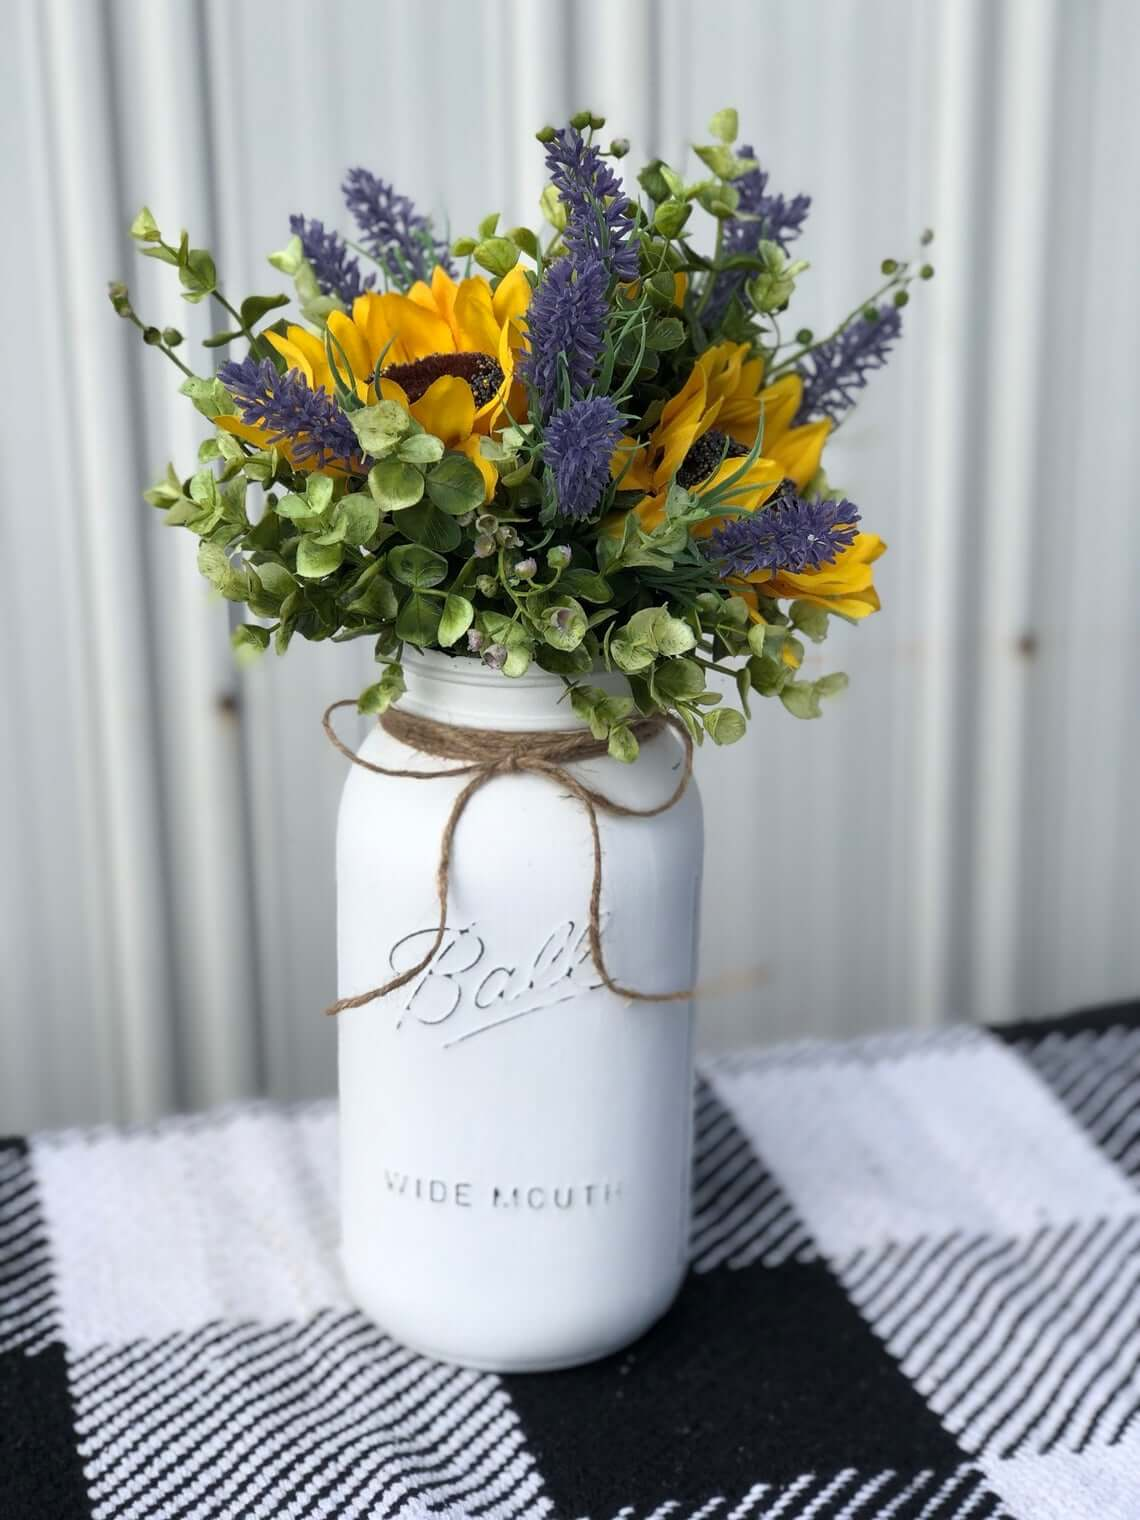 Personalized Handmade Sunflower Summer Centerpiece